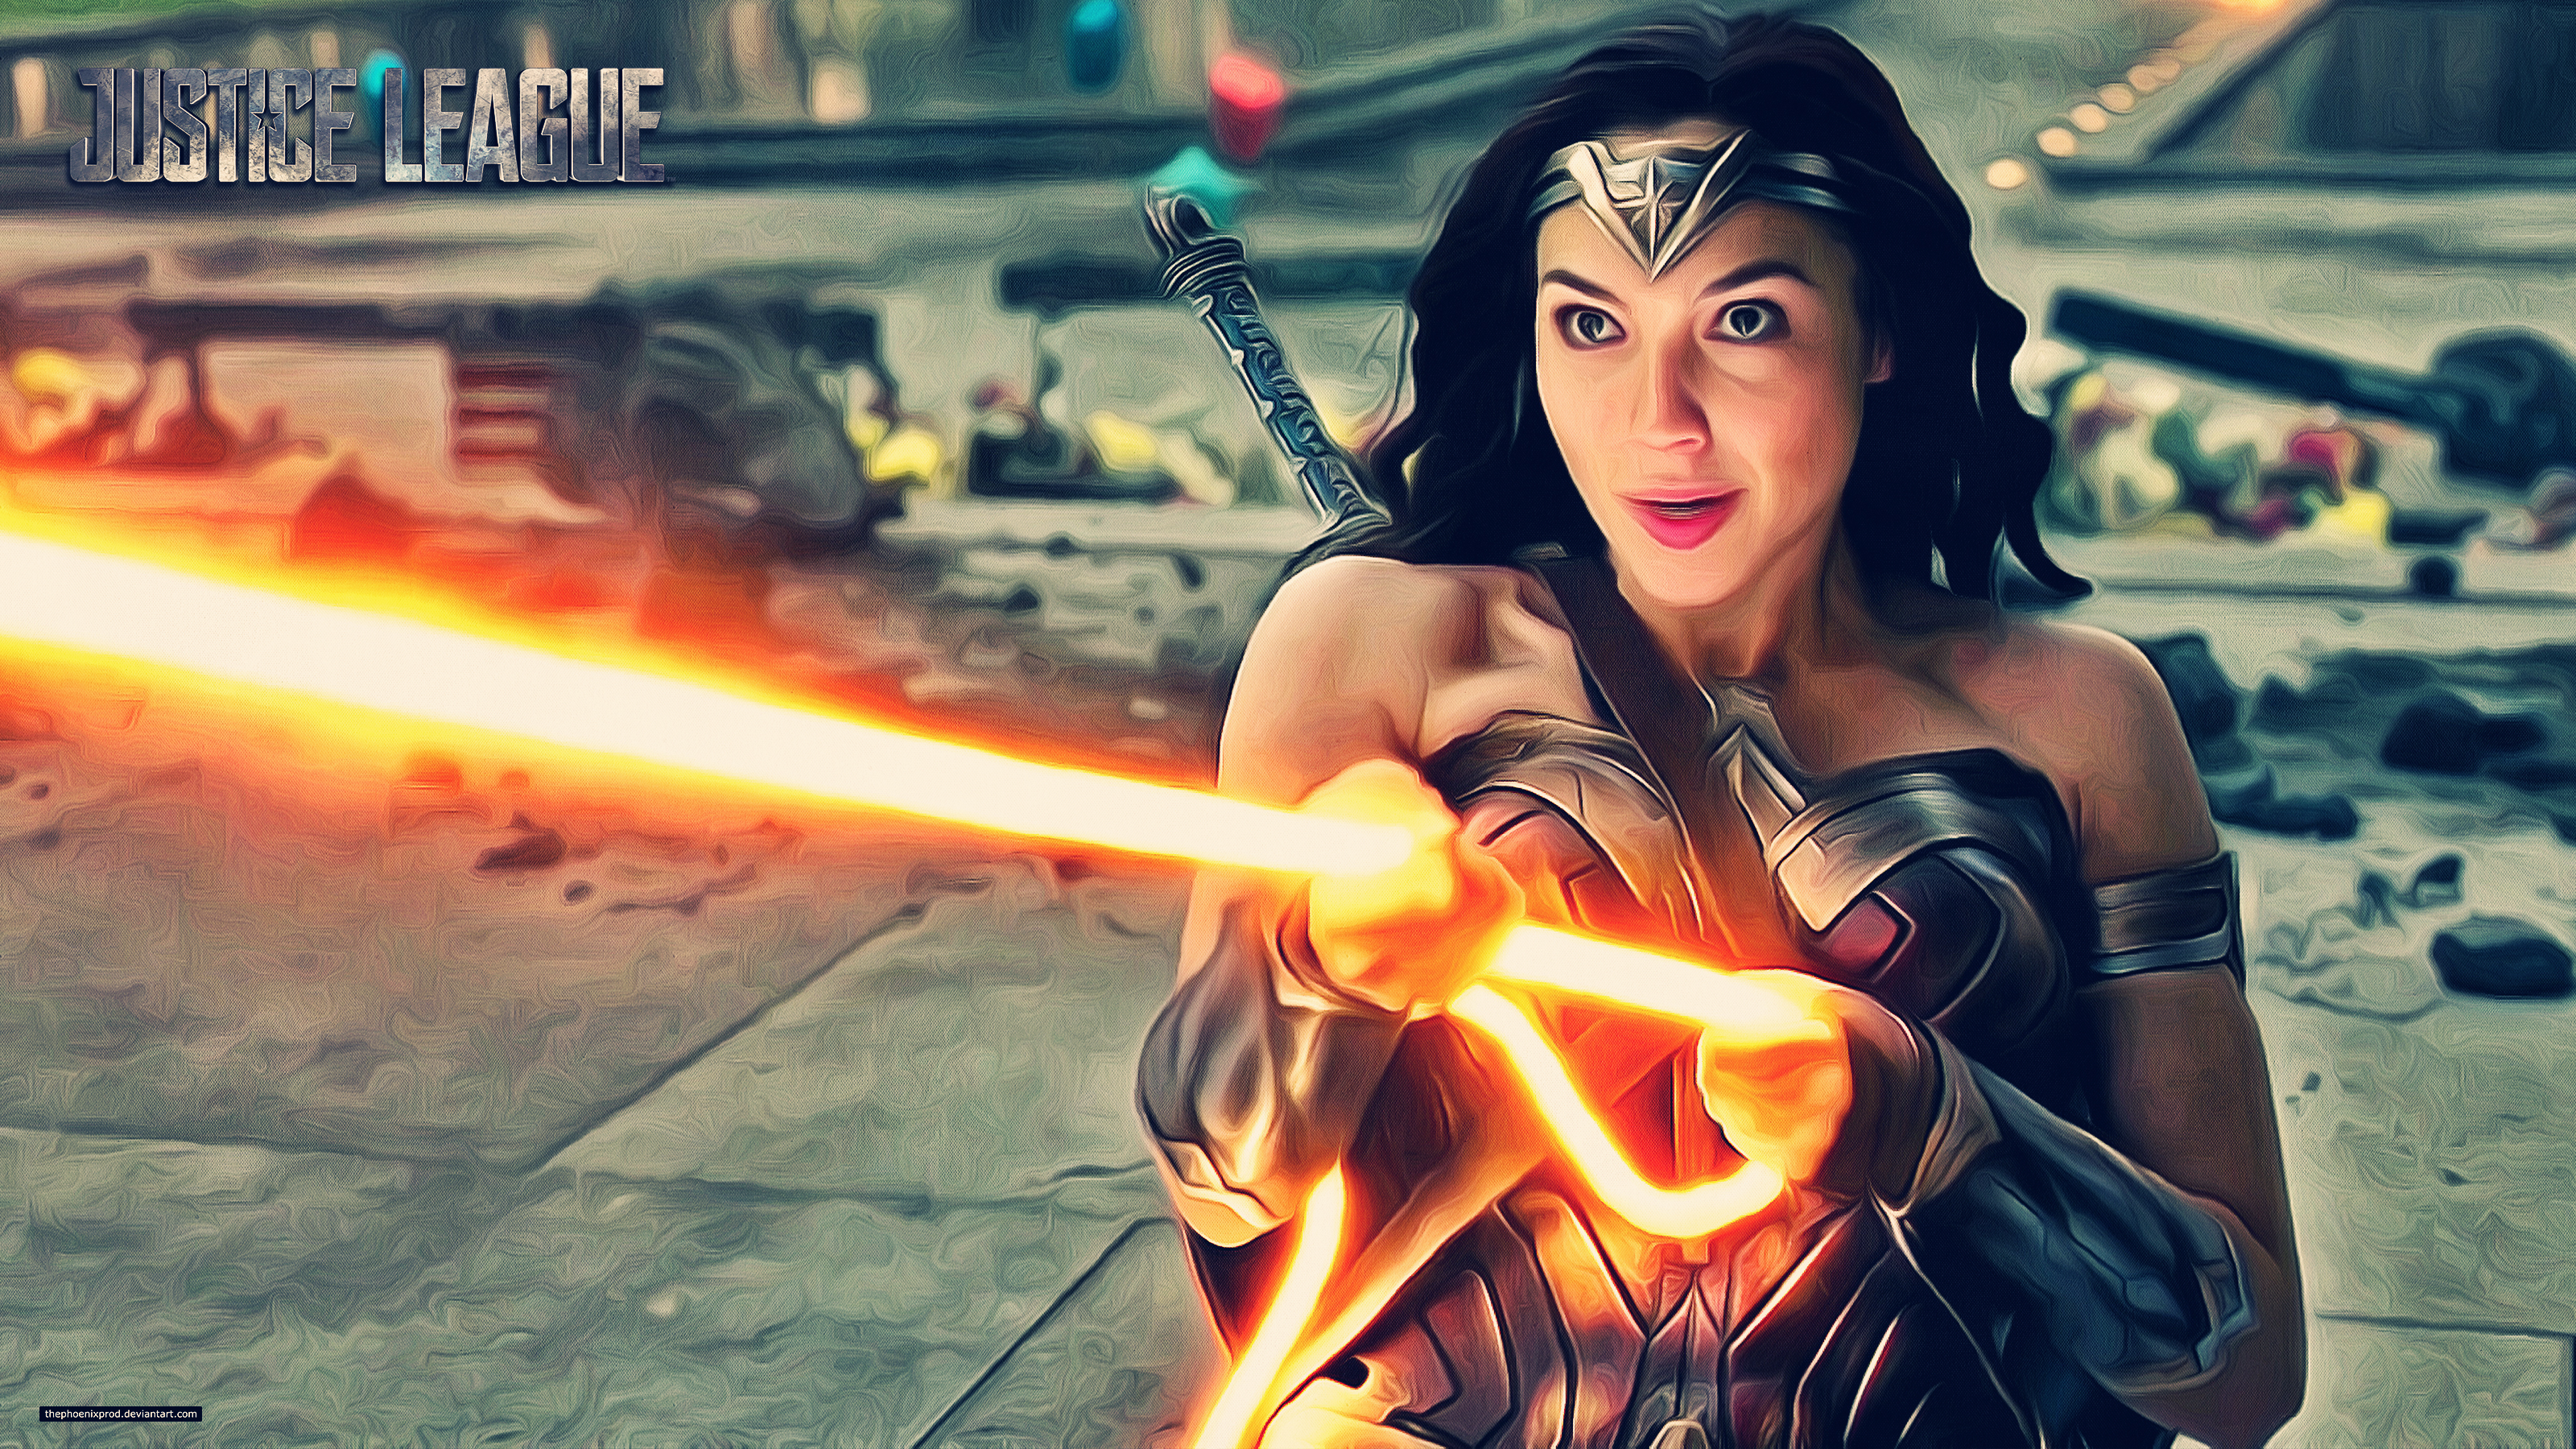 Wallpaper Wonder Woman Gal Gadot Hd 4k 2017 Movies 2361: Justice League Wonder Woman 4k, HD Movies, 4k Wallpapers